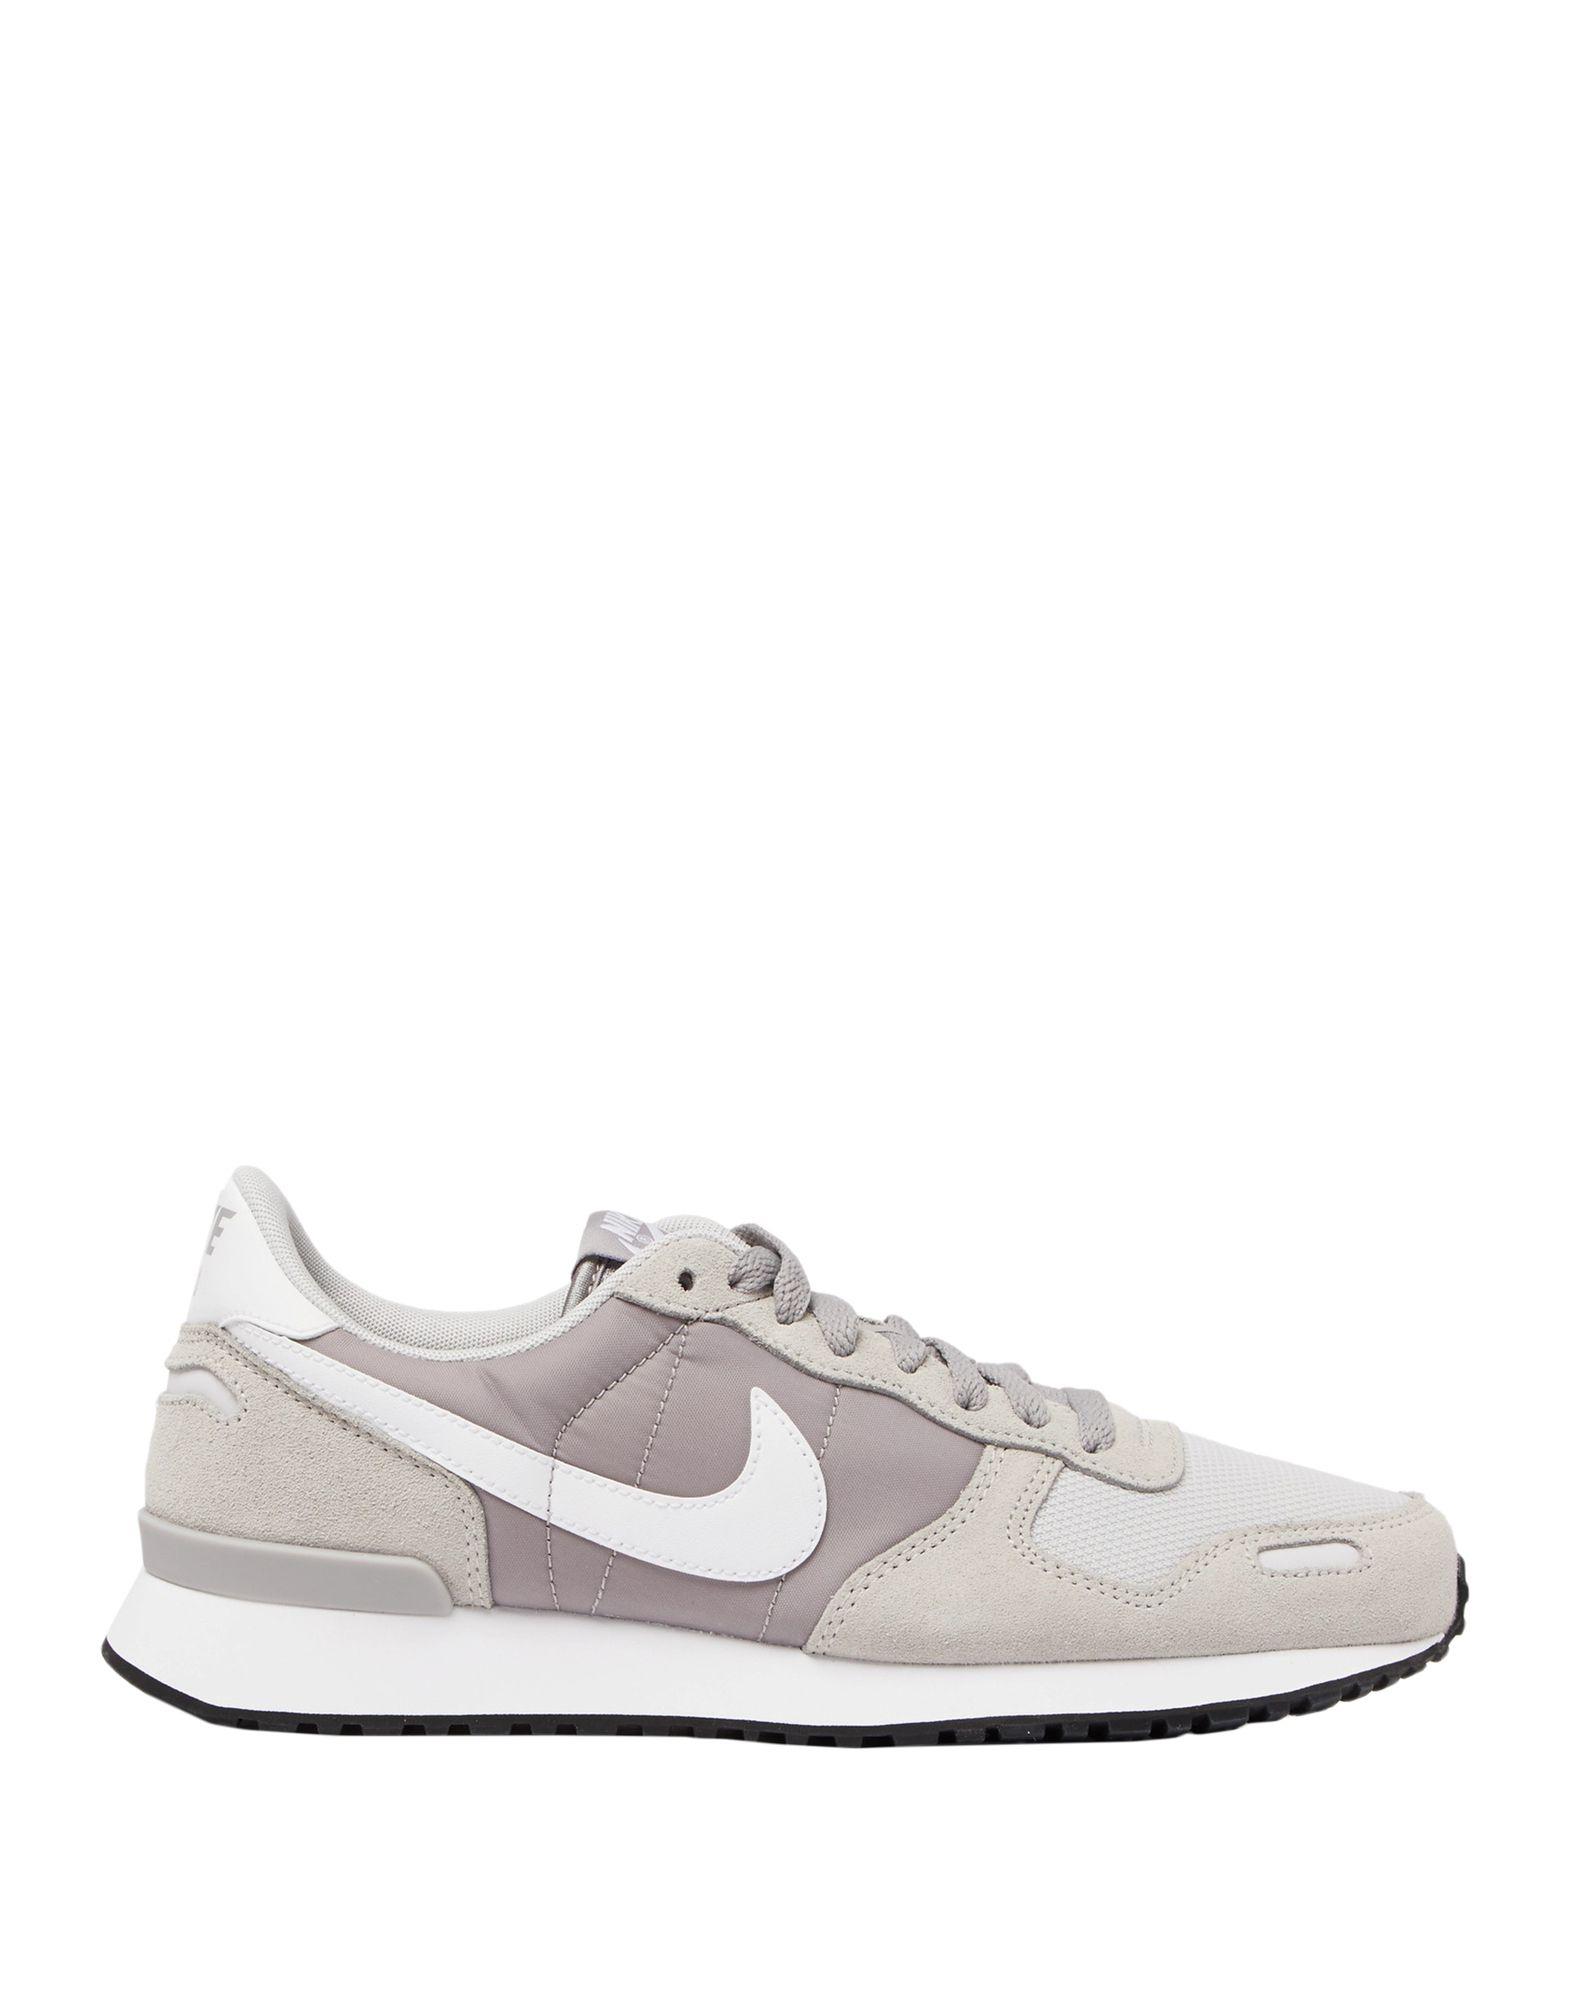 Baskets Nike Homme - baskets Nike   - 11689463LS